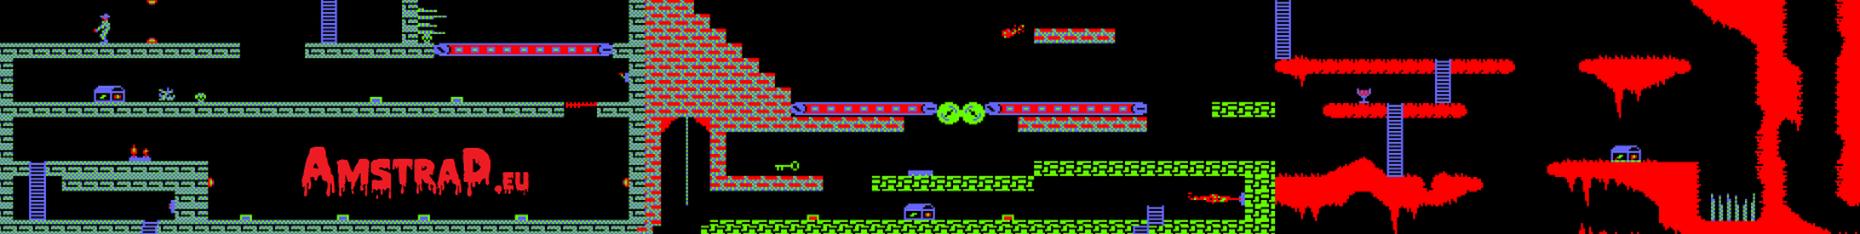 Amstrad.eu : Ordinateur Amstrad CPC 464 6128 CPC Plus GX4000